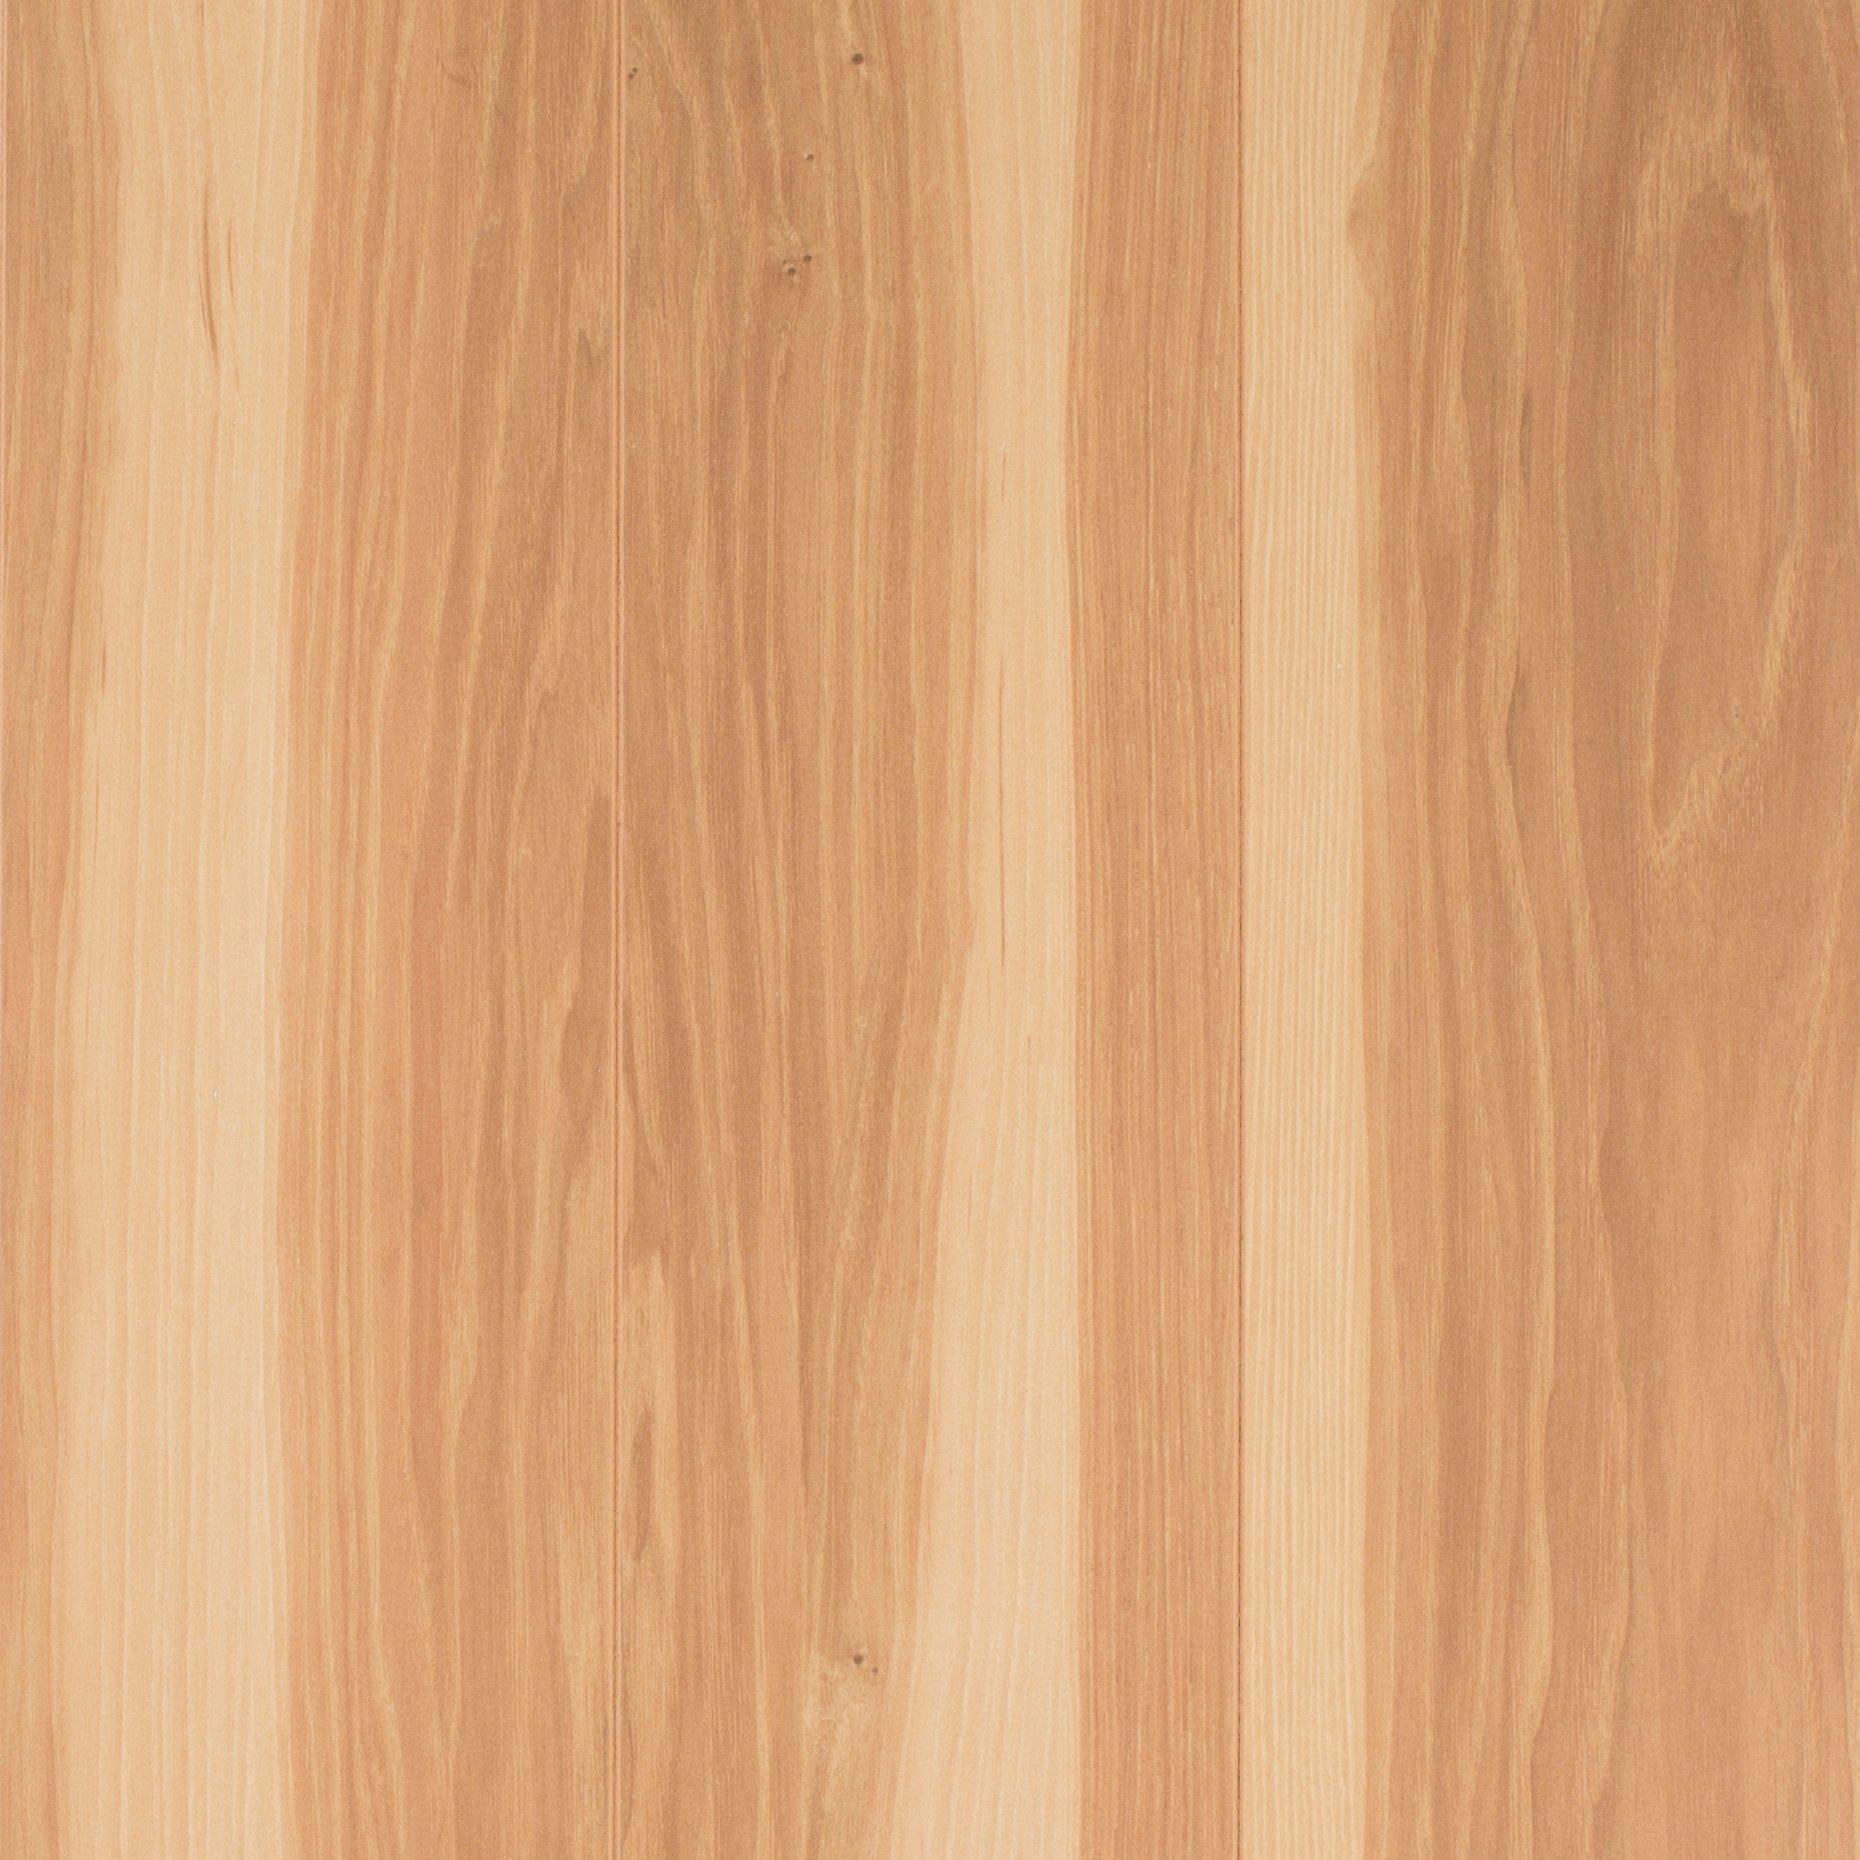 Hickory laminate flooring dixon run appalachian hickory 8 for Hickory laminate flooring